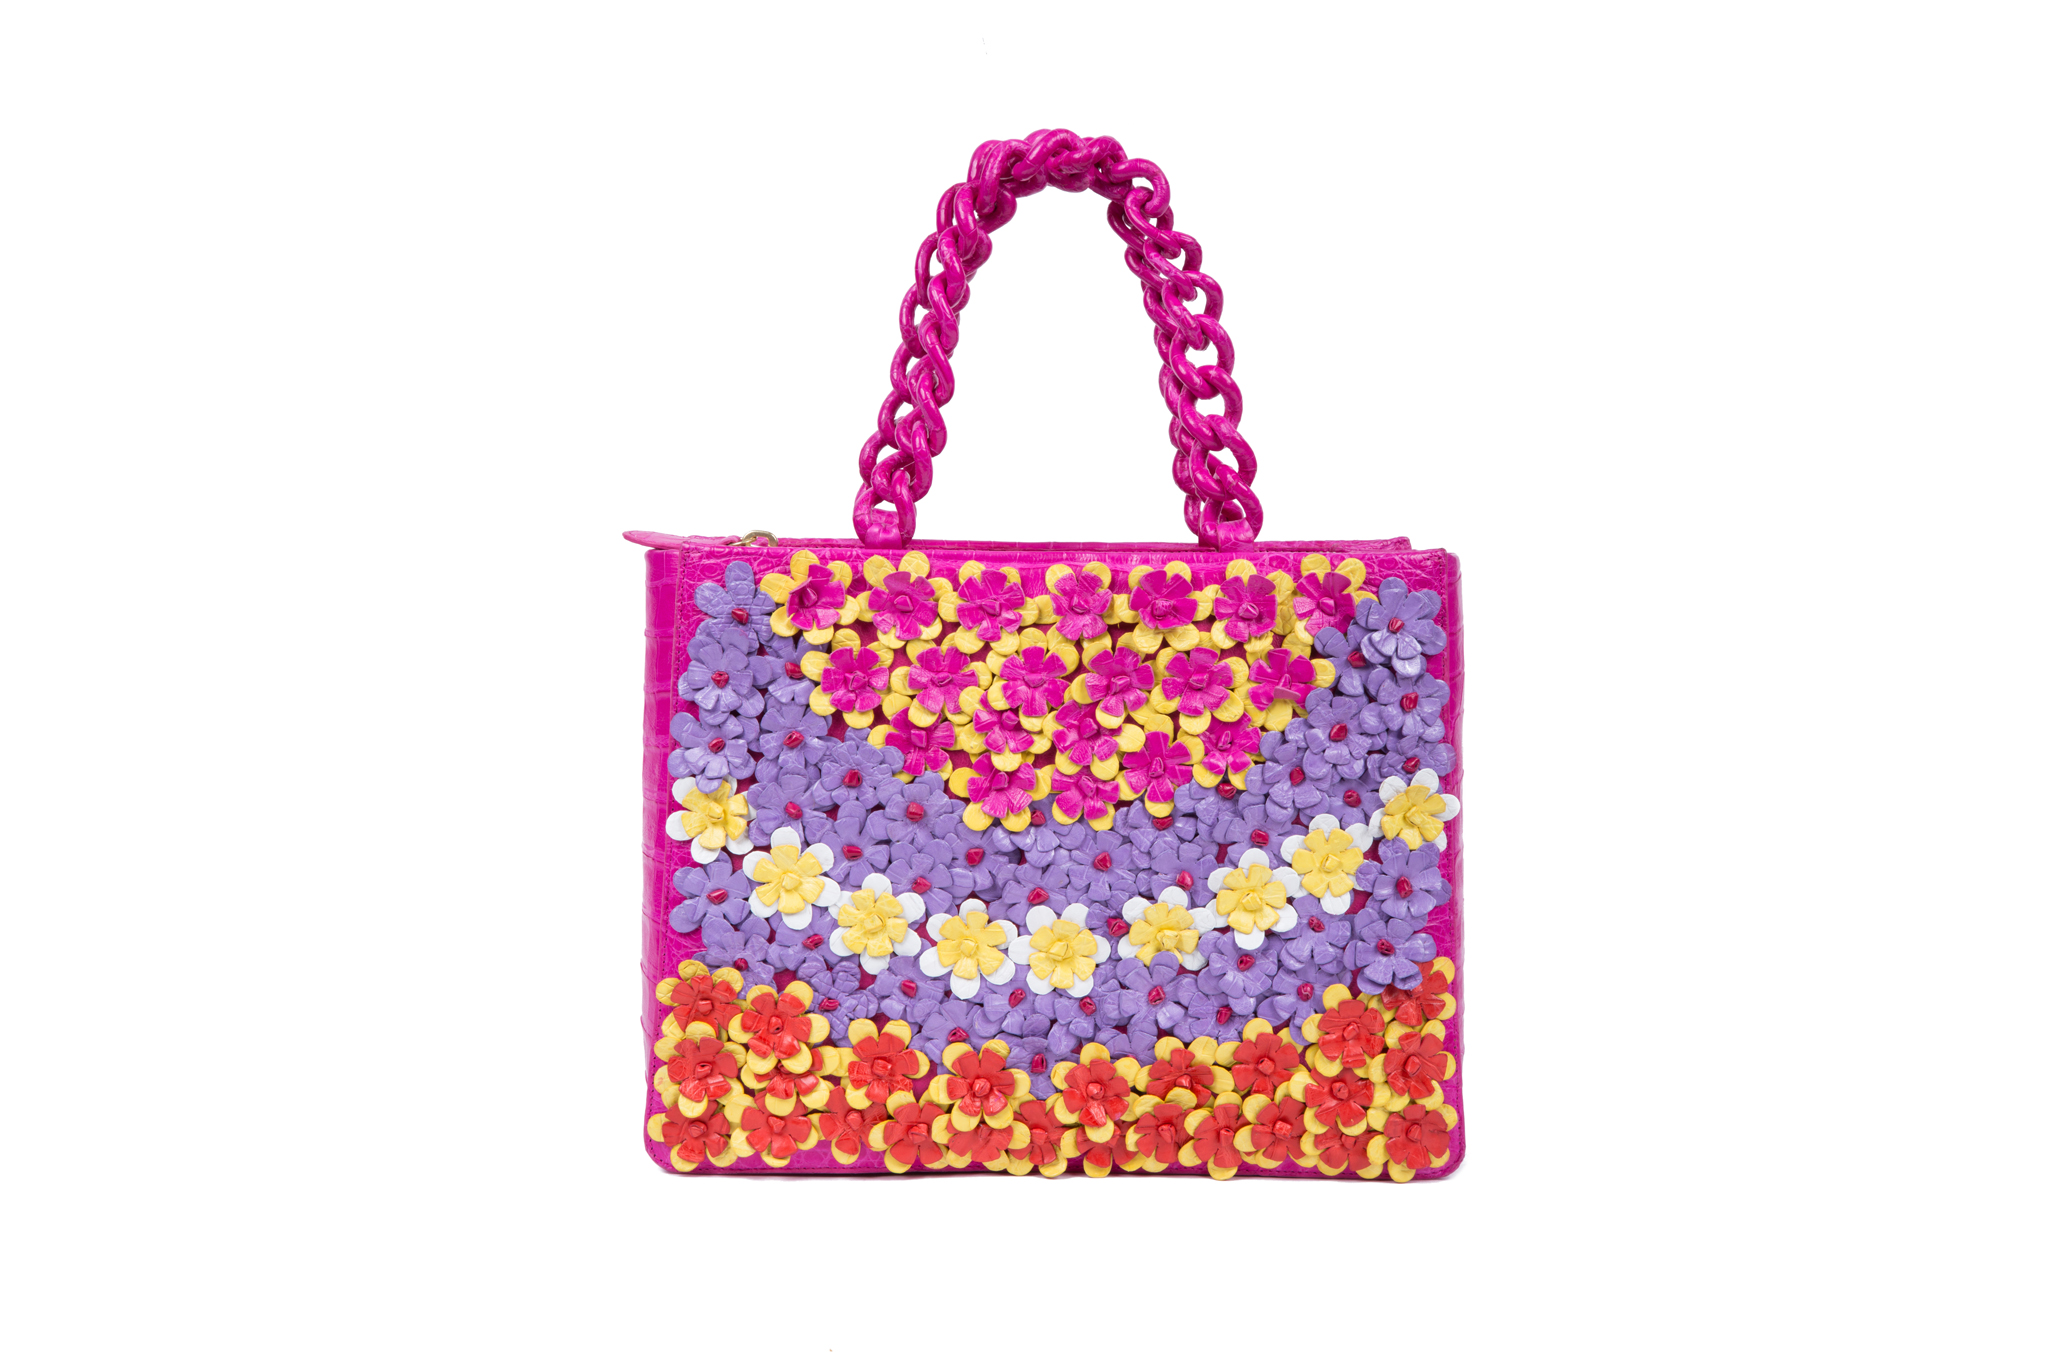 Resort 2016 Accessories Trend: 3-D Floral Embellishment